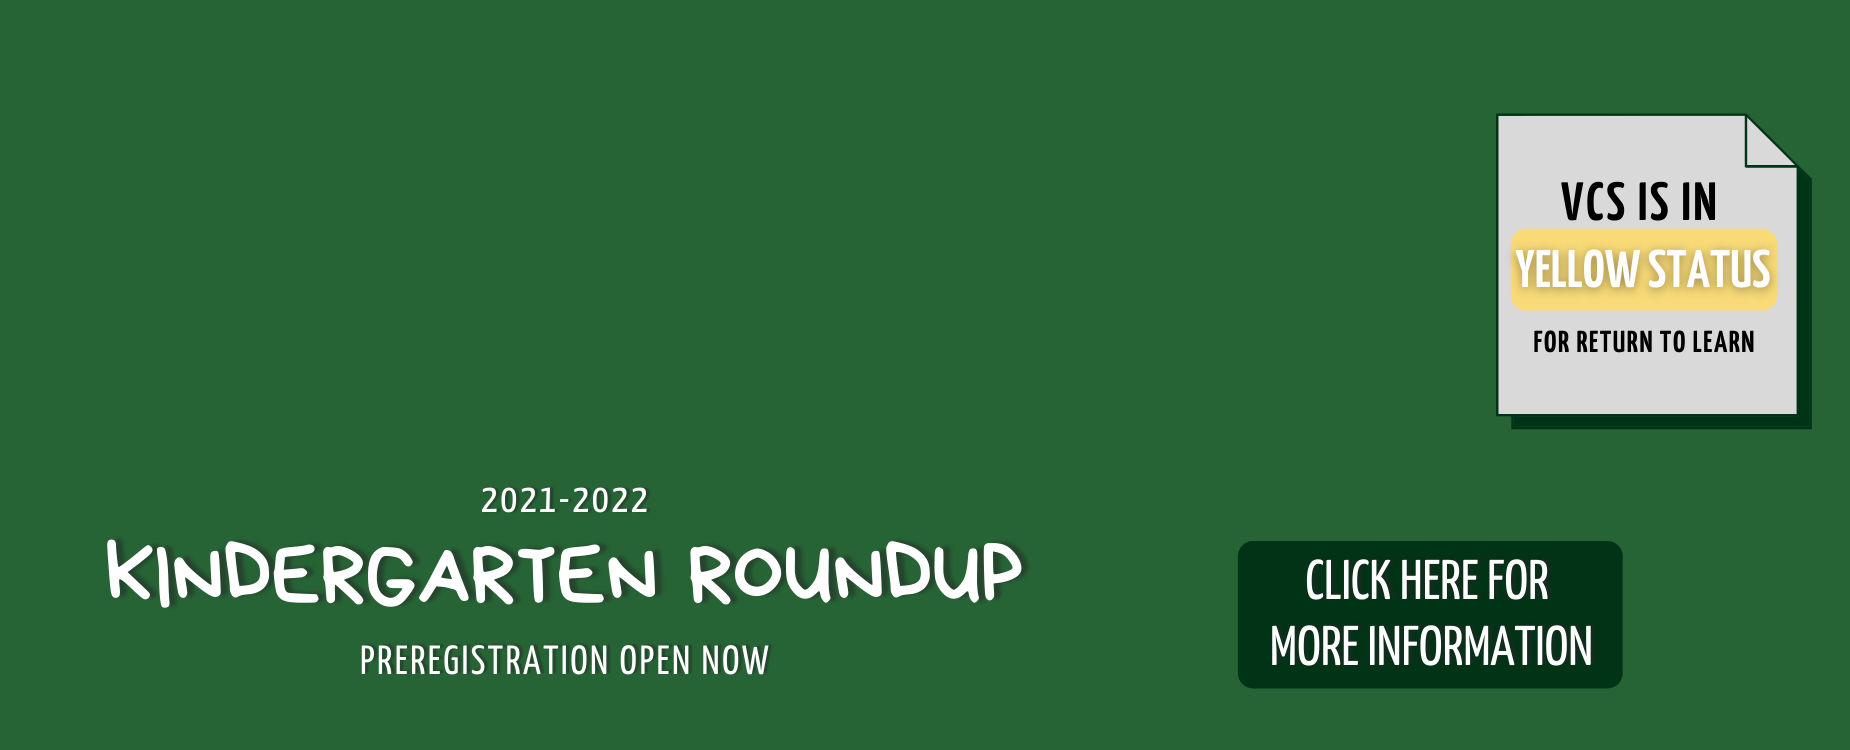 Kindergarten Roundup Preregistration Information